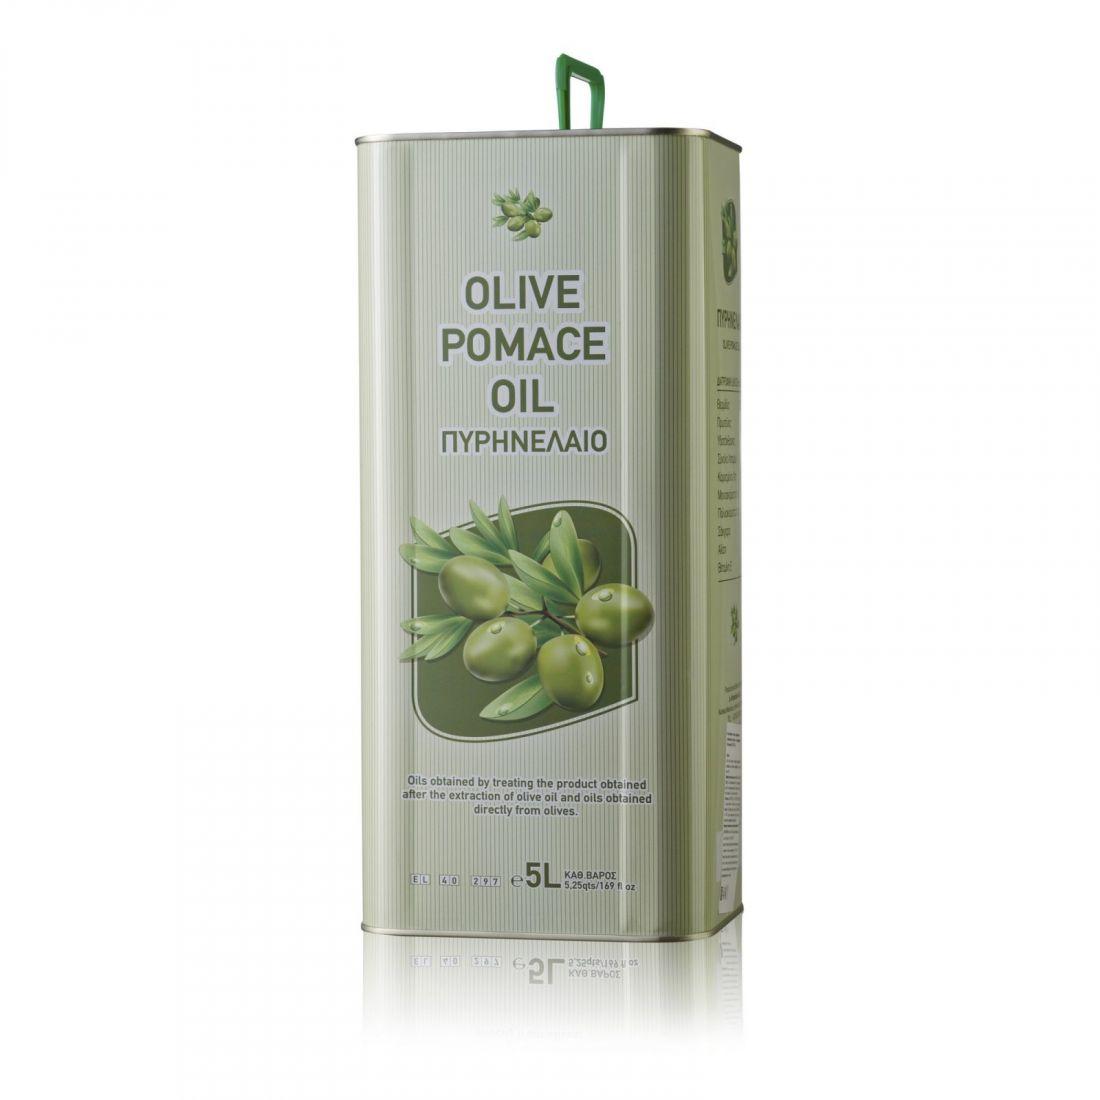 Оливковое масло CRETAN MILL - 5 л помас, для жарки, жестяная банка